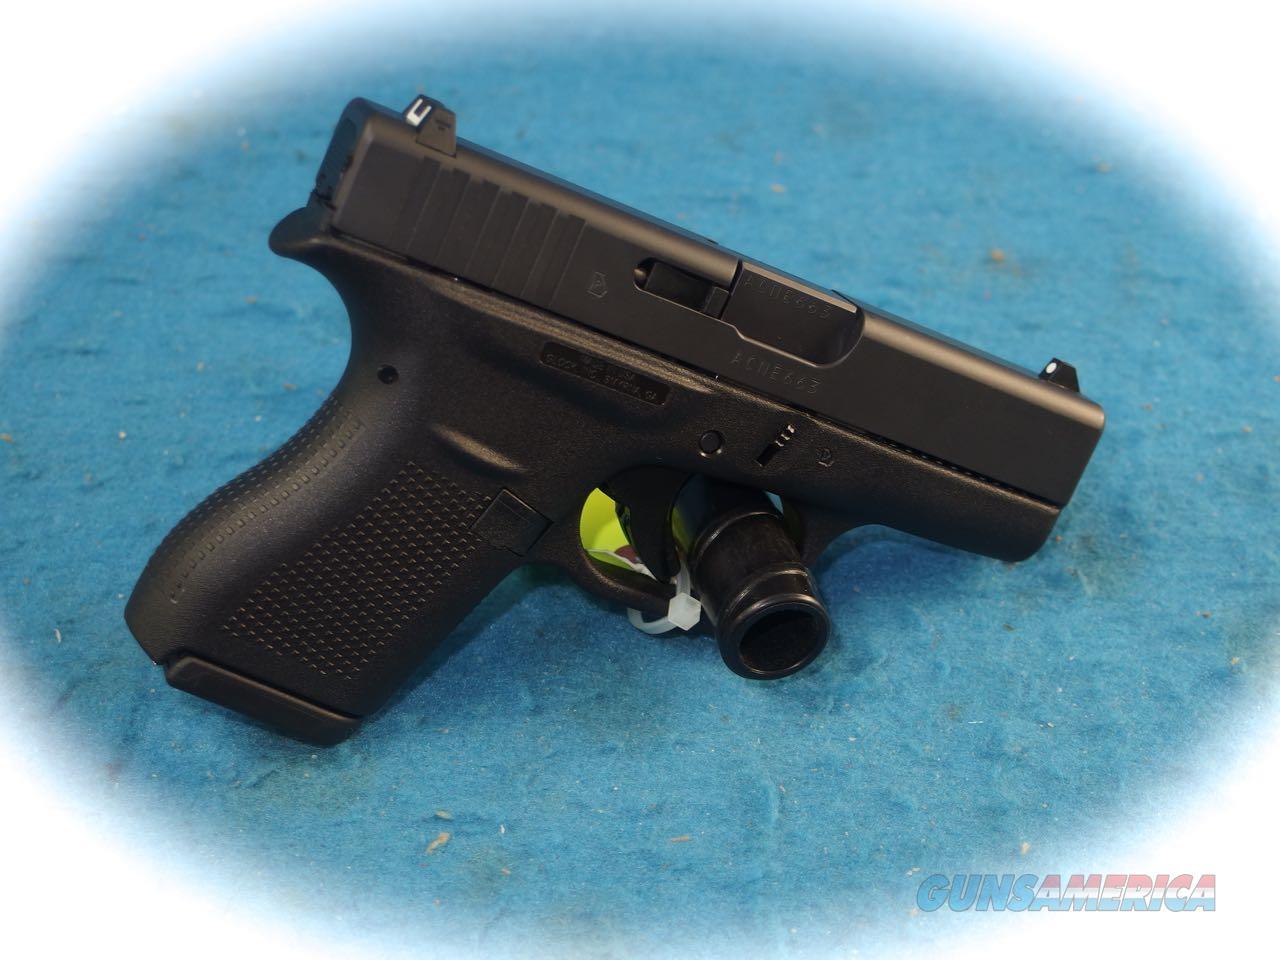 Glock Model 42 .380 ACP Pistol **New**  Guns > Pistols > Glock Pistols > 42